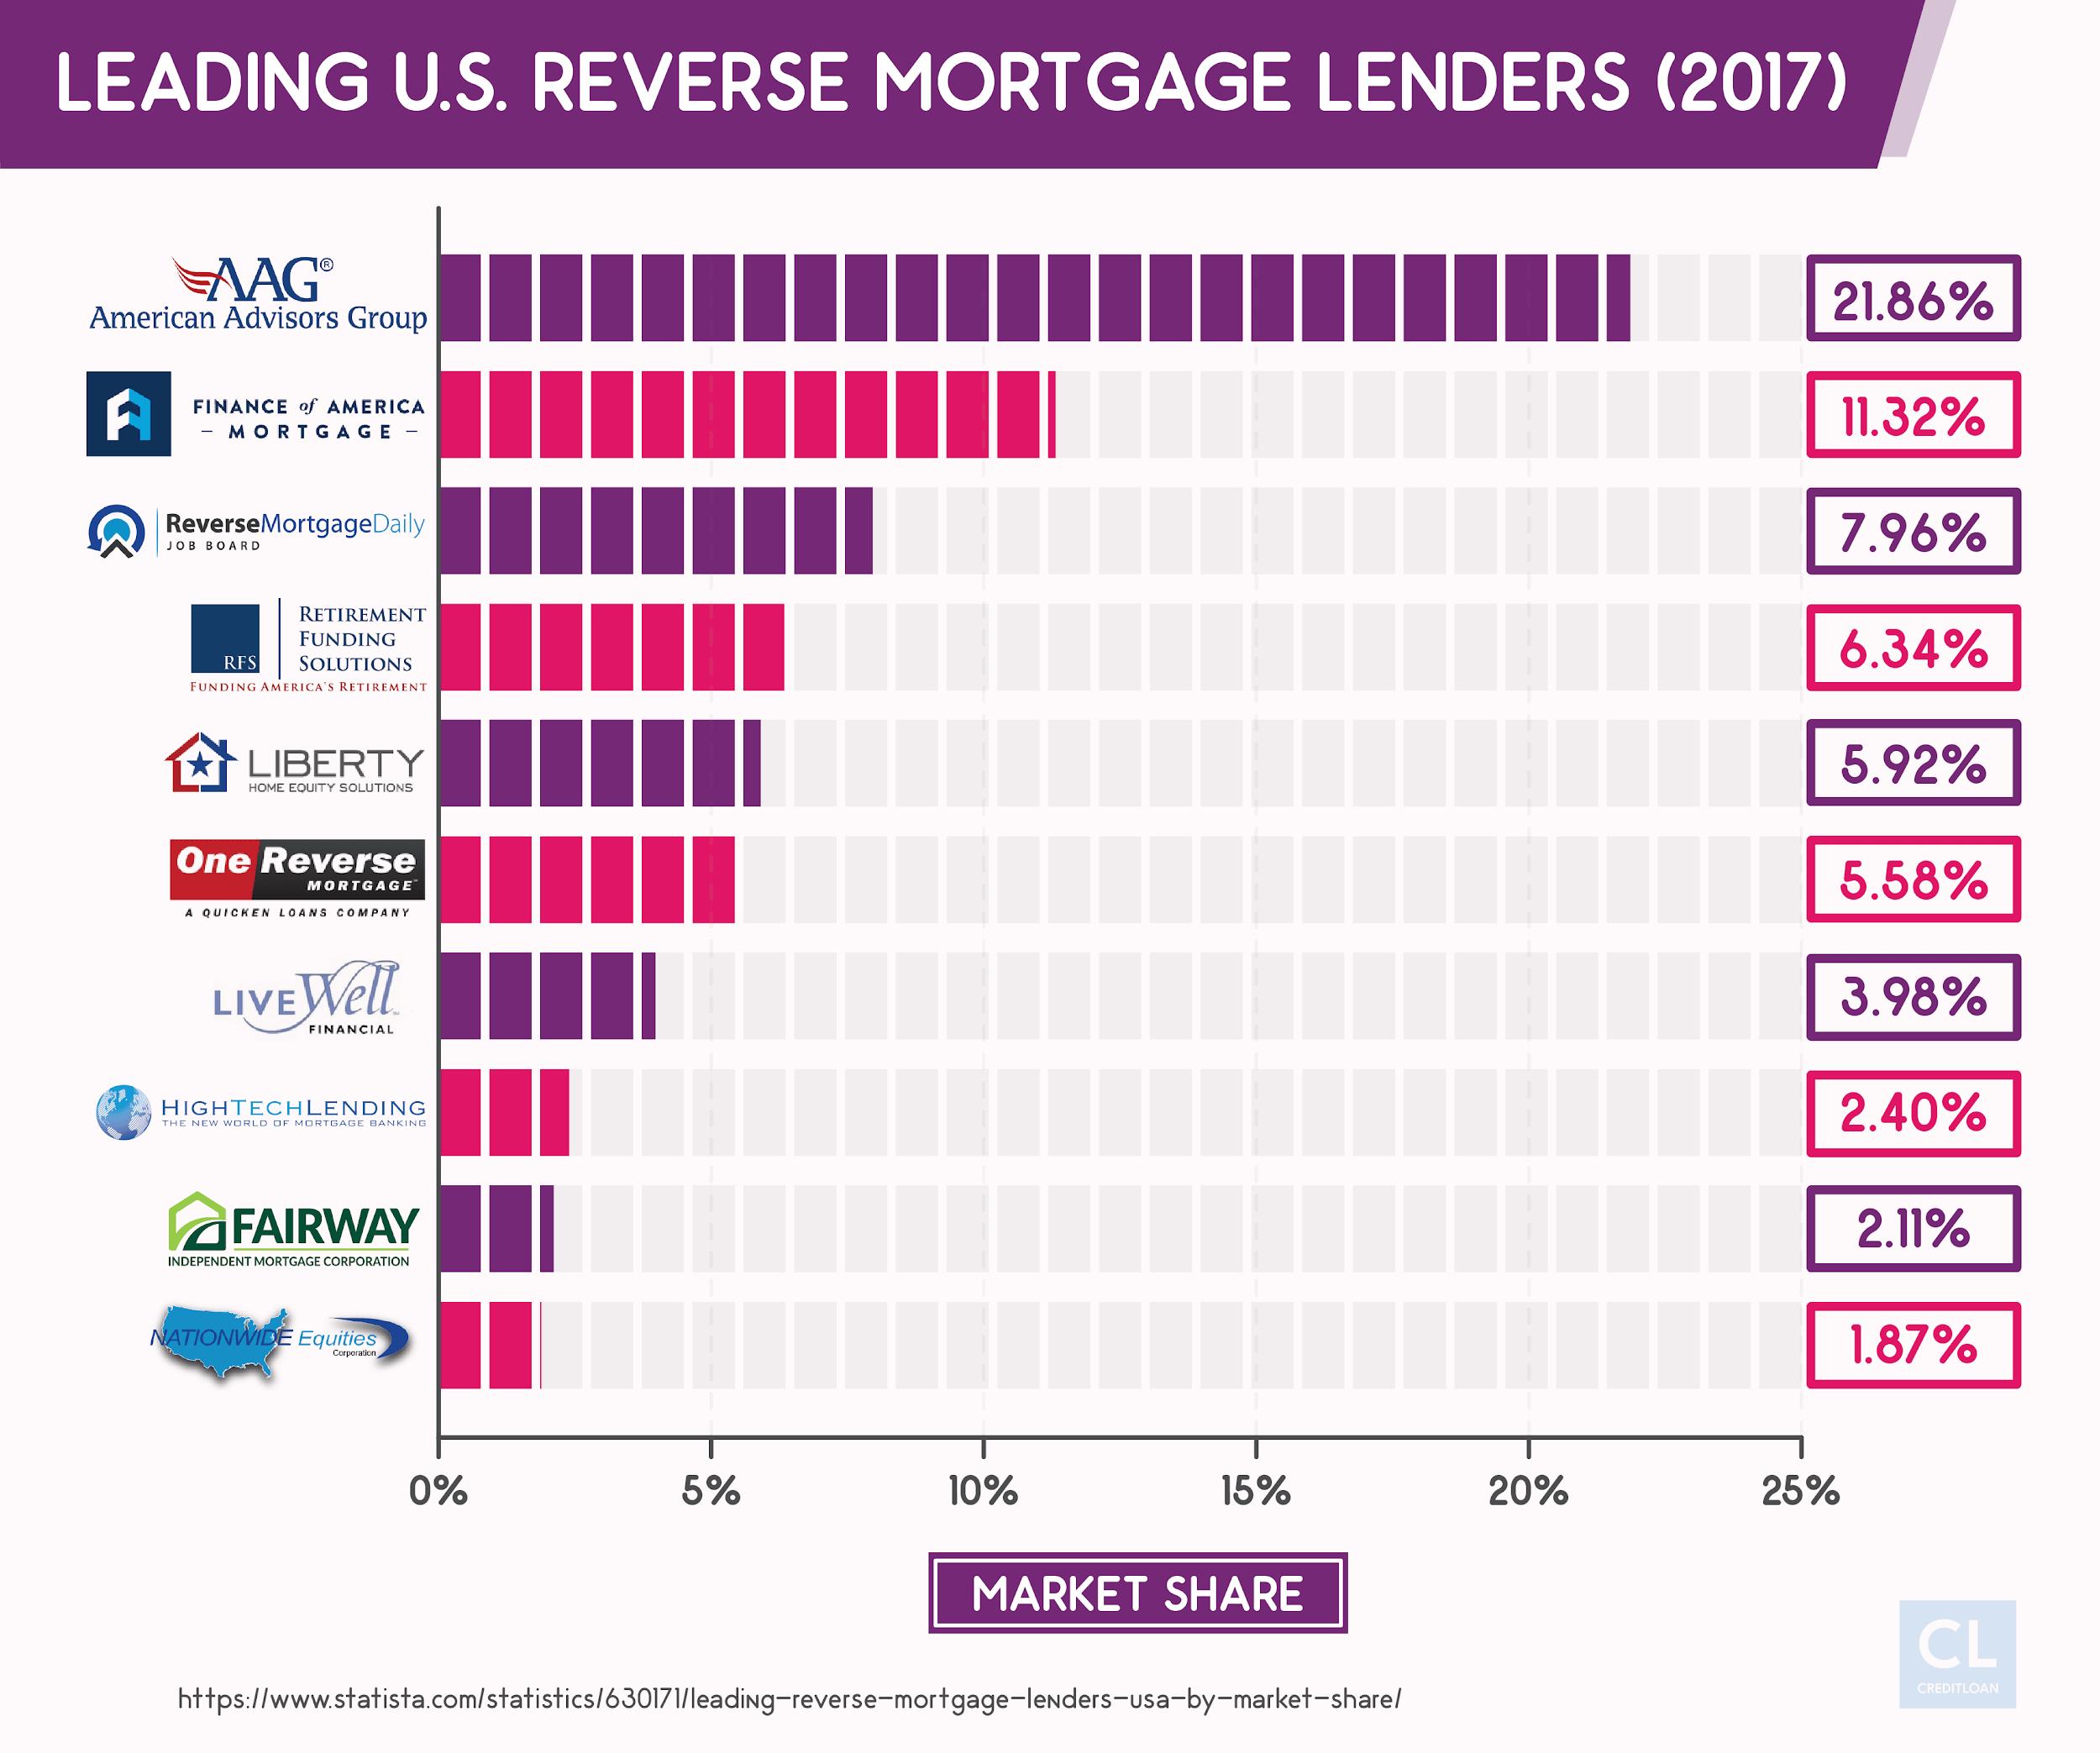 Leading U.S. Reverse Mortgage Lenders